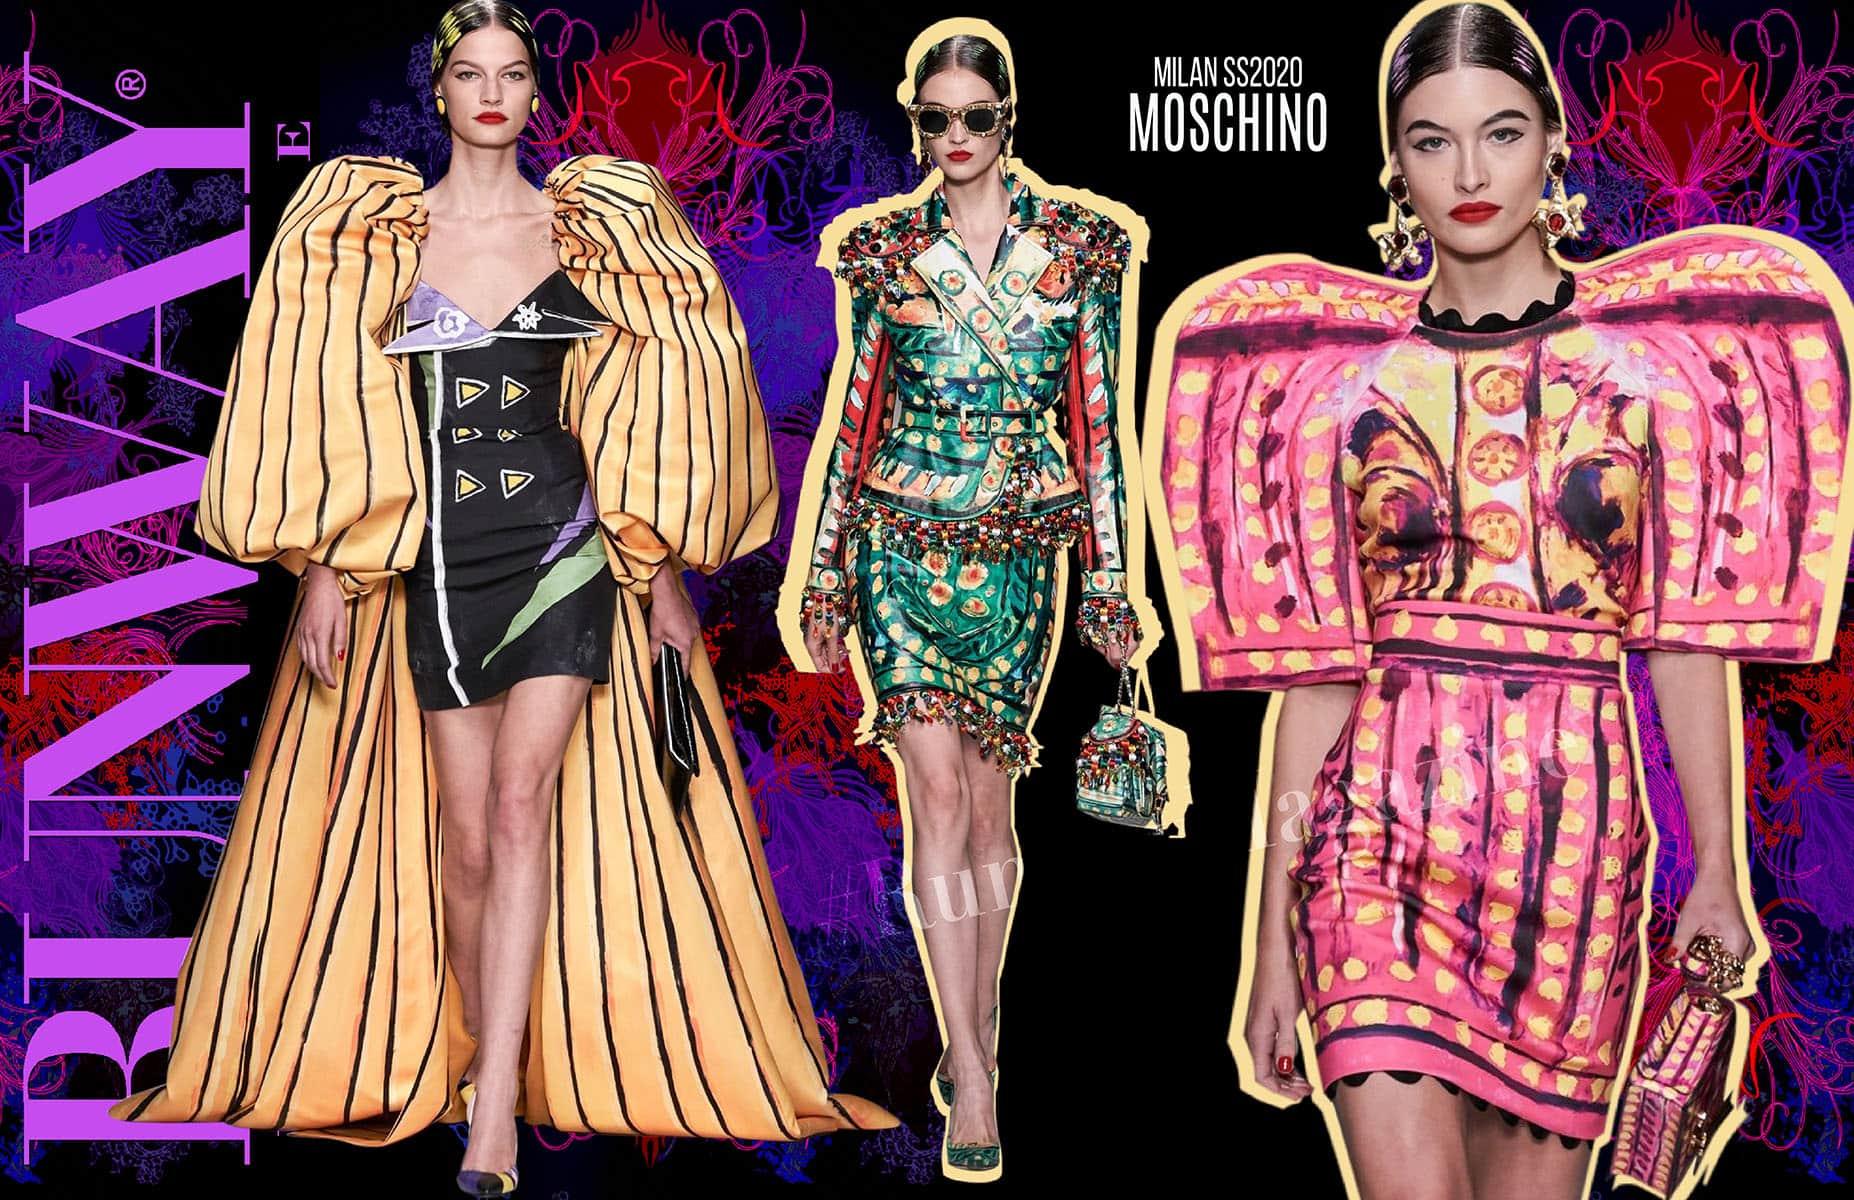 Moschino Spring Summer 2020 Milan by Runway Magazine